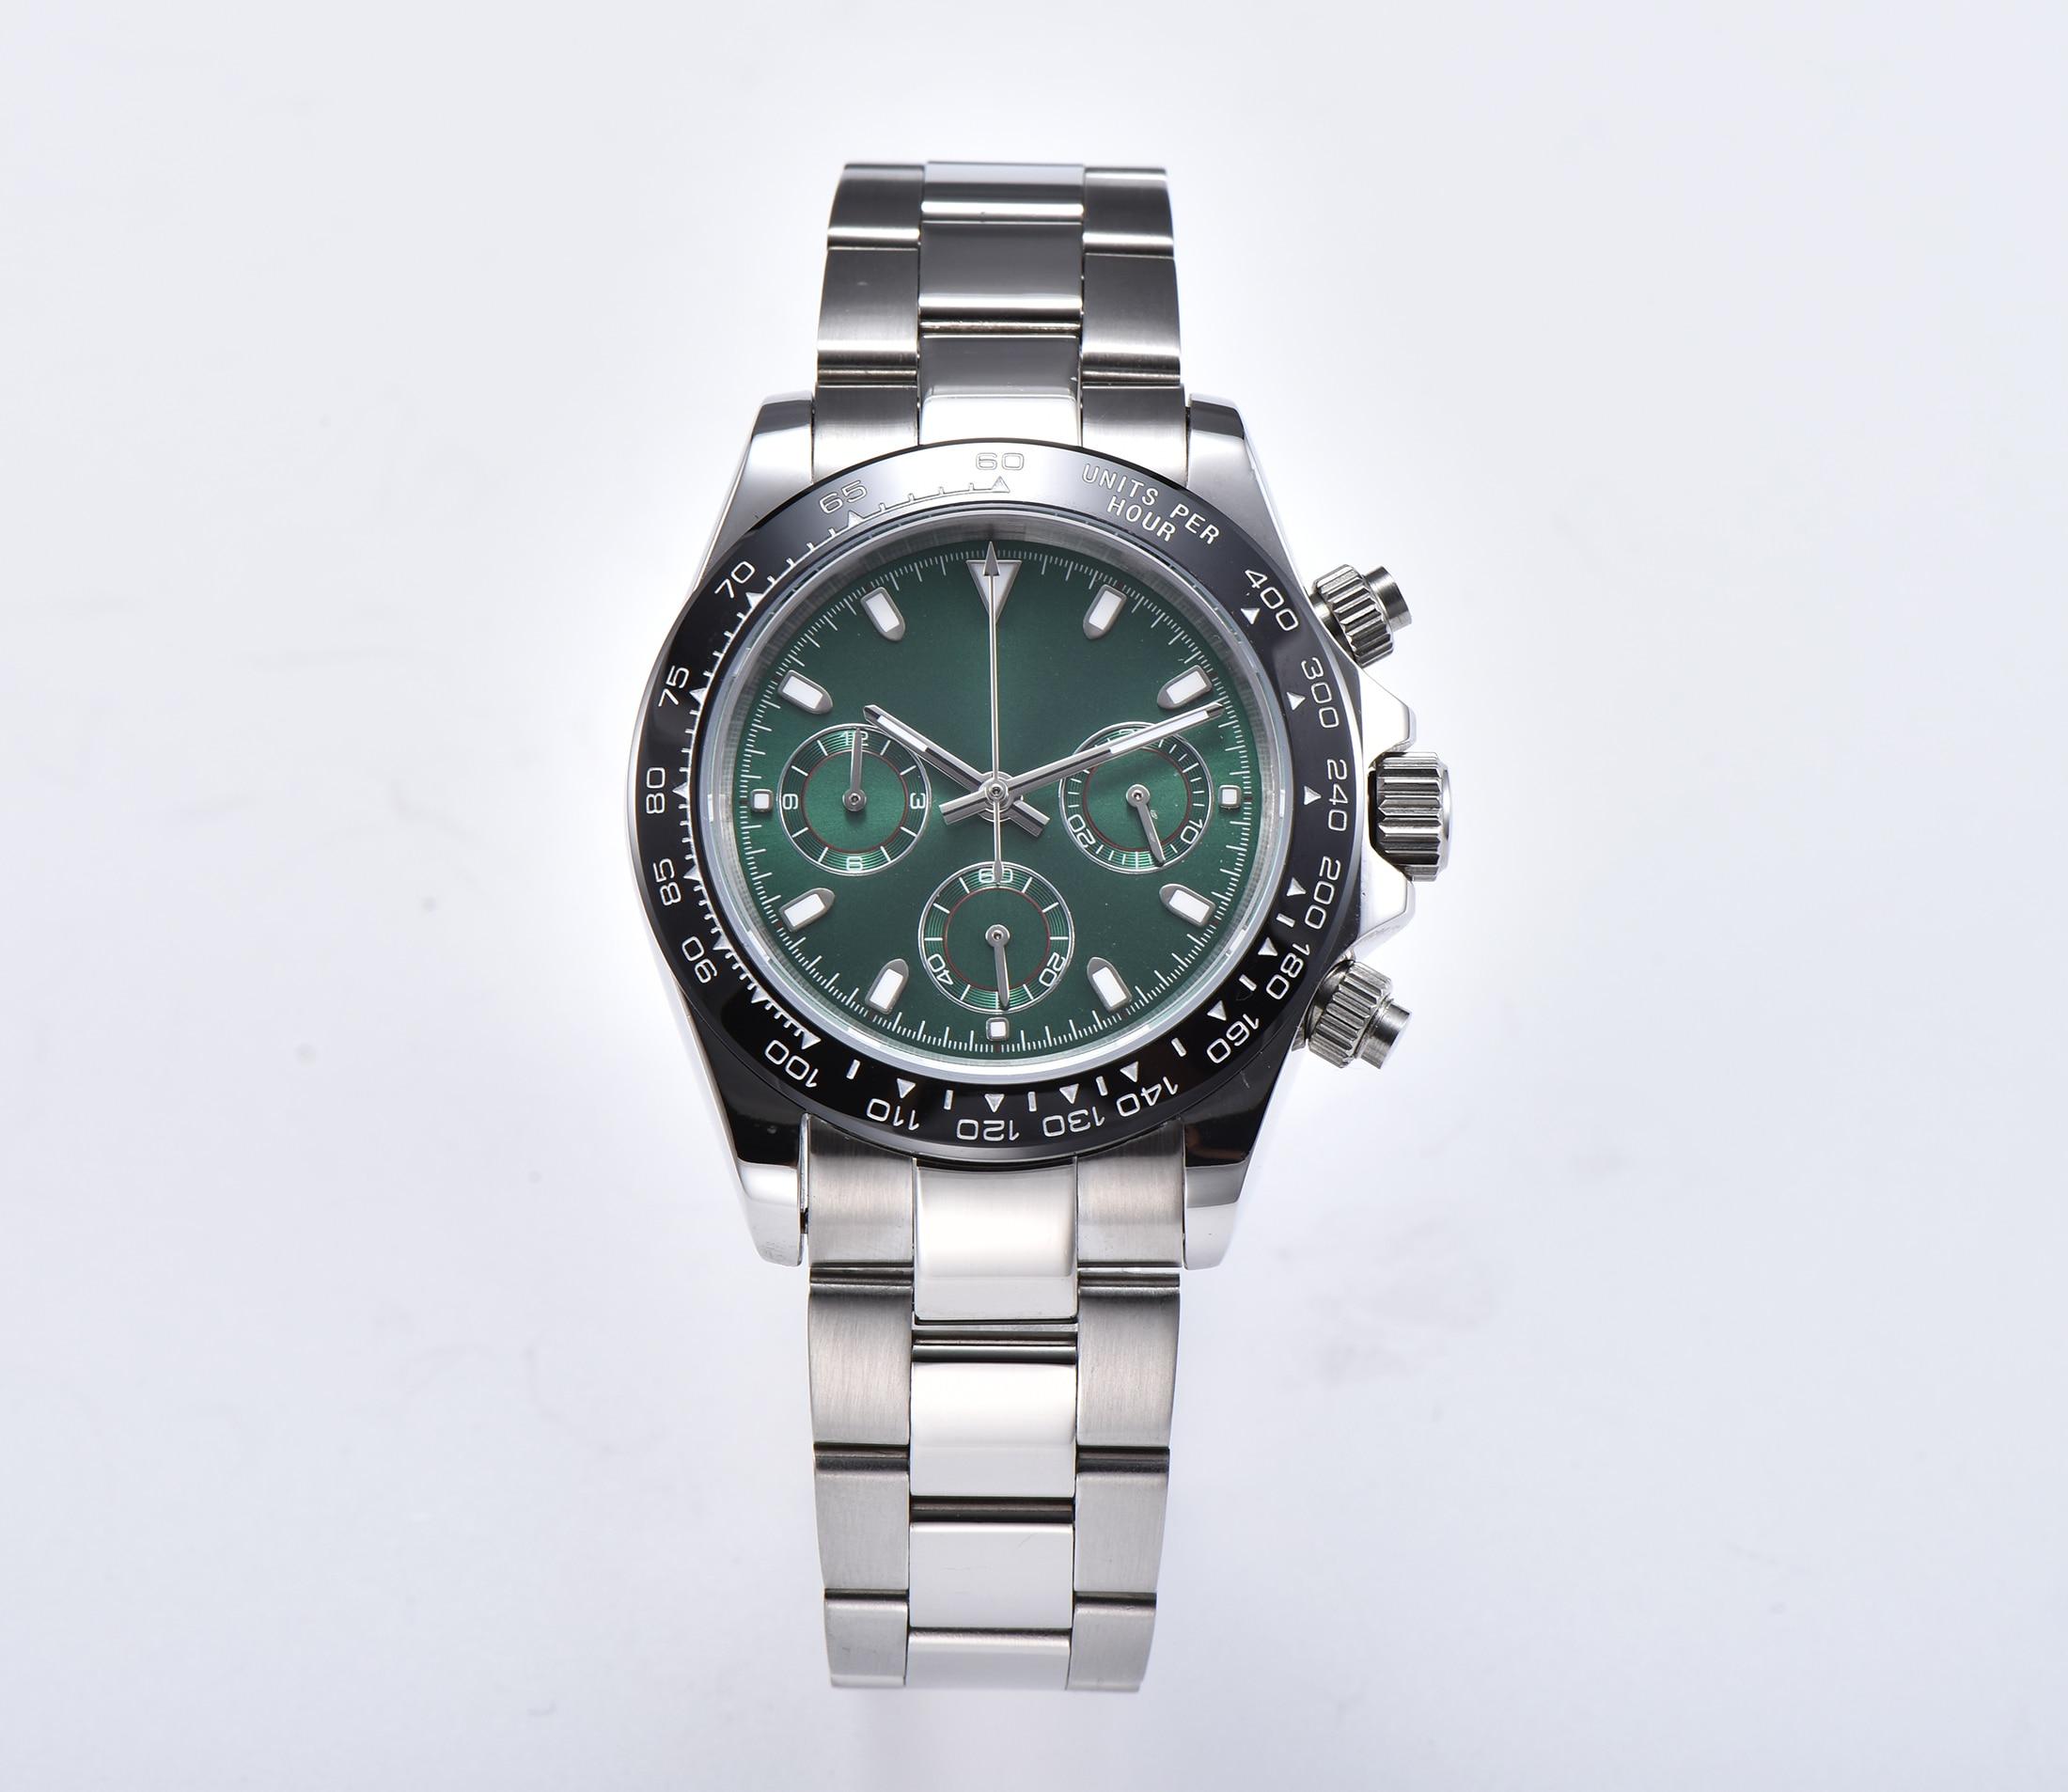 Reloj cronógrafo japonés VK63, movimiento de cuarzo, 39MM, esfera estéril, luminosa, manos, zafiro, caja de fibra de vidrio, pulsera TO342